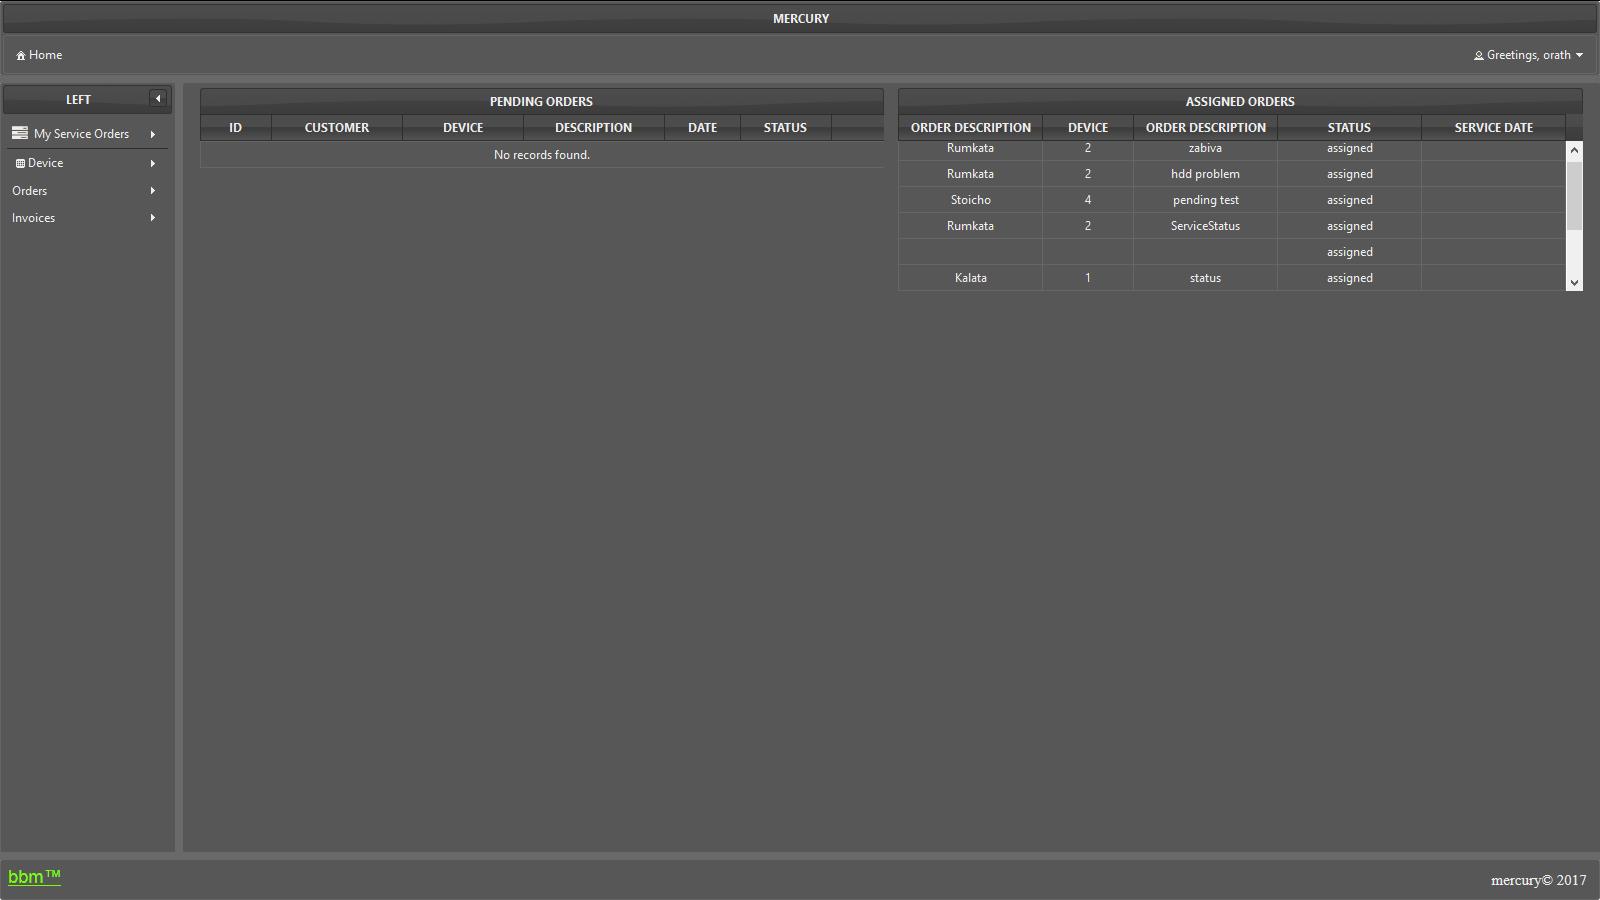 GitHub - DeSsMon7/mercury: Service Software